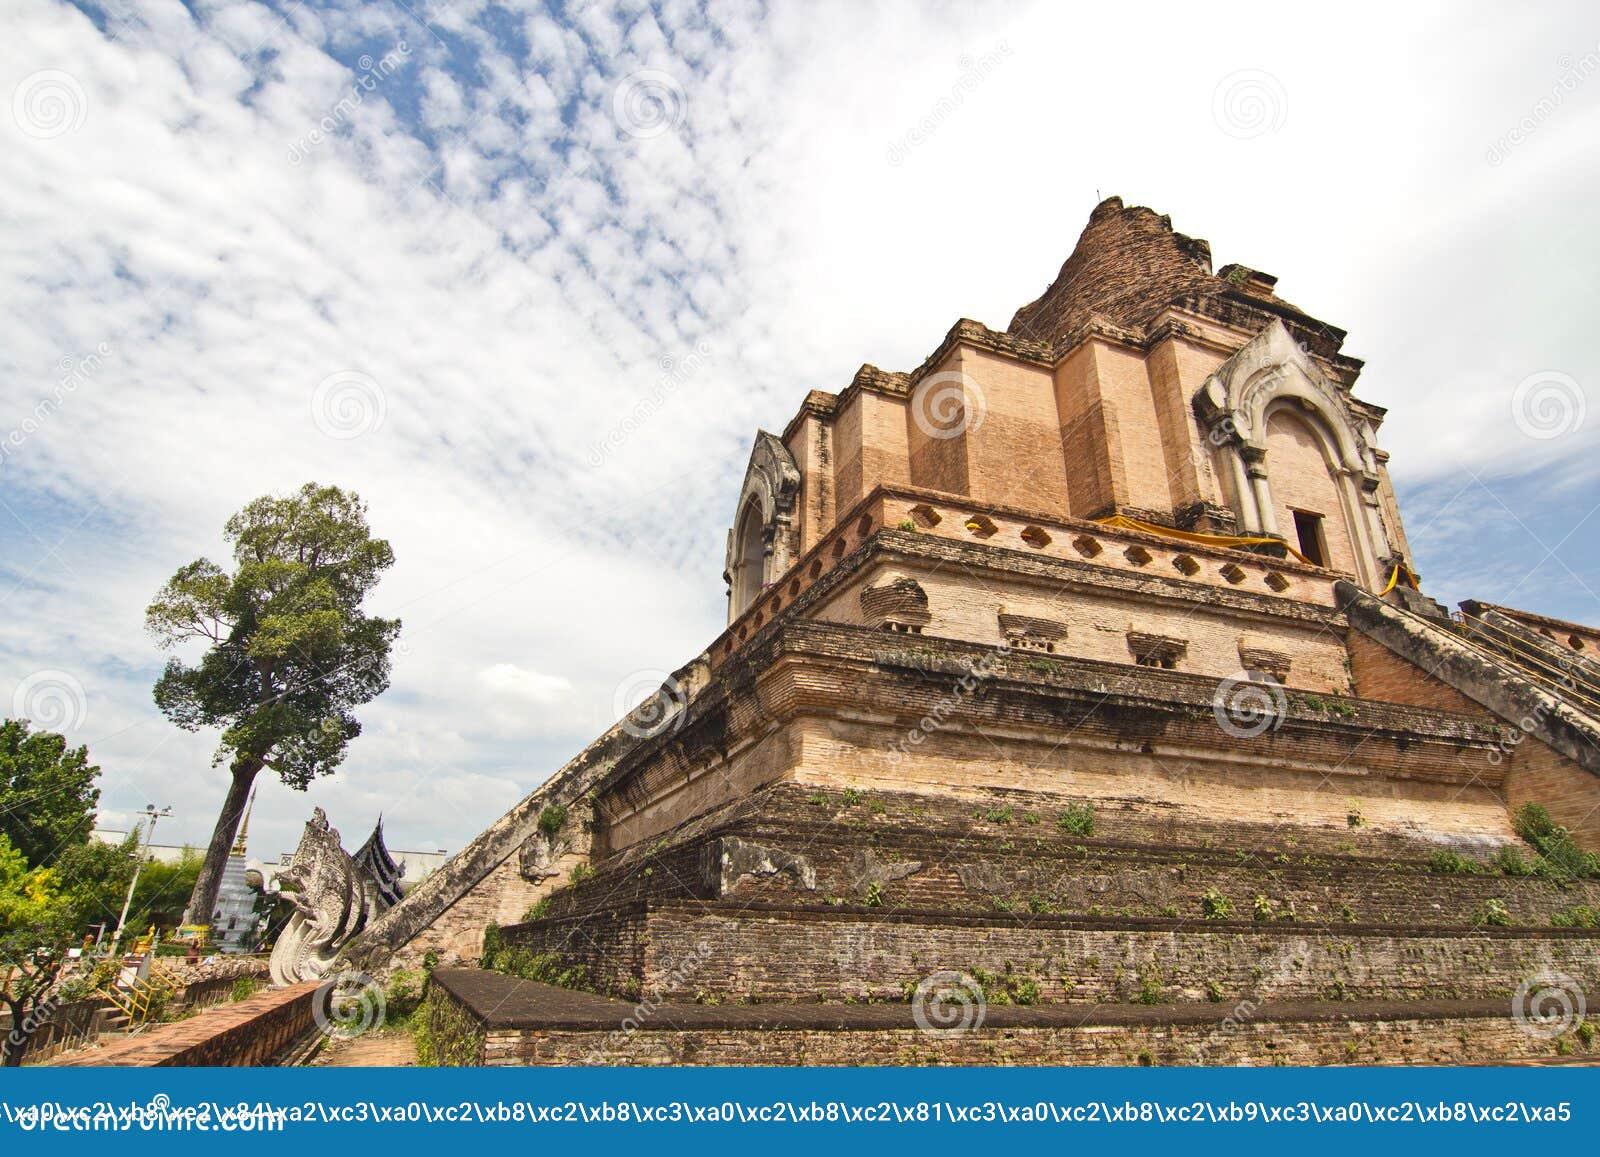 Broken pagoda thailand